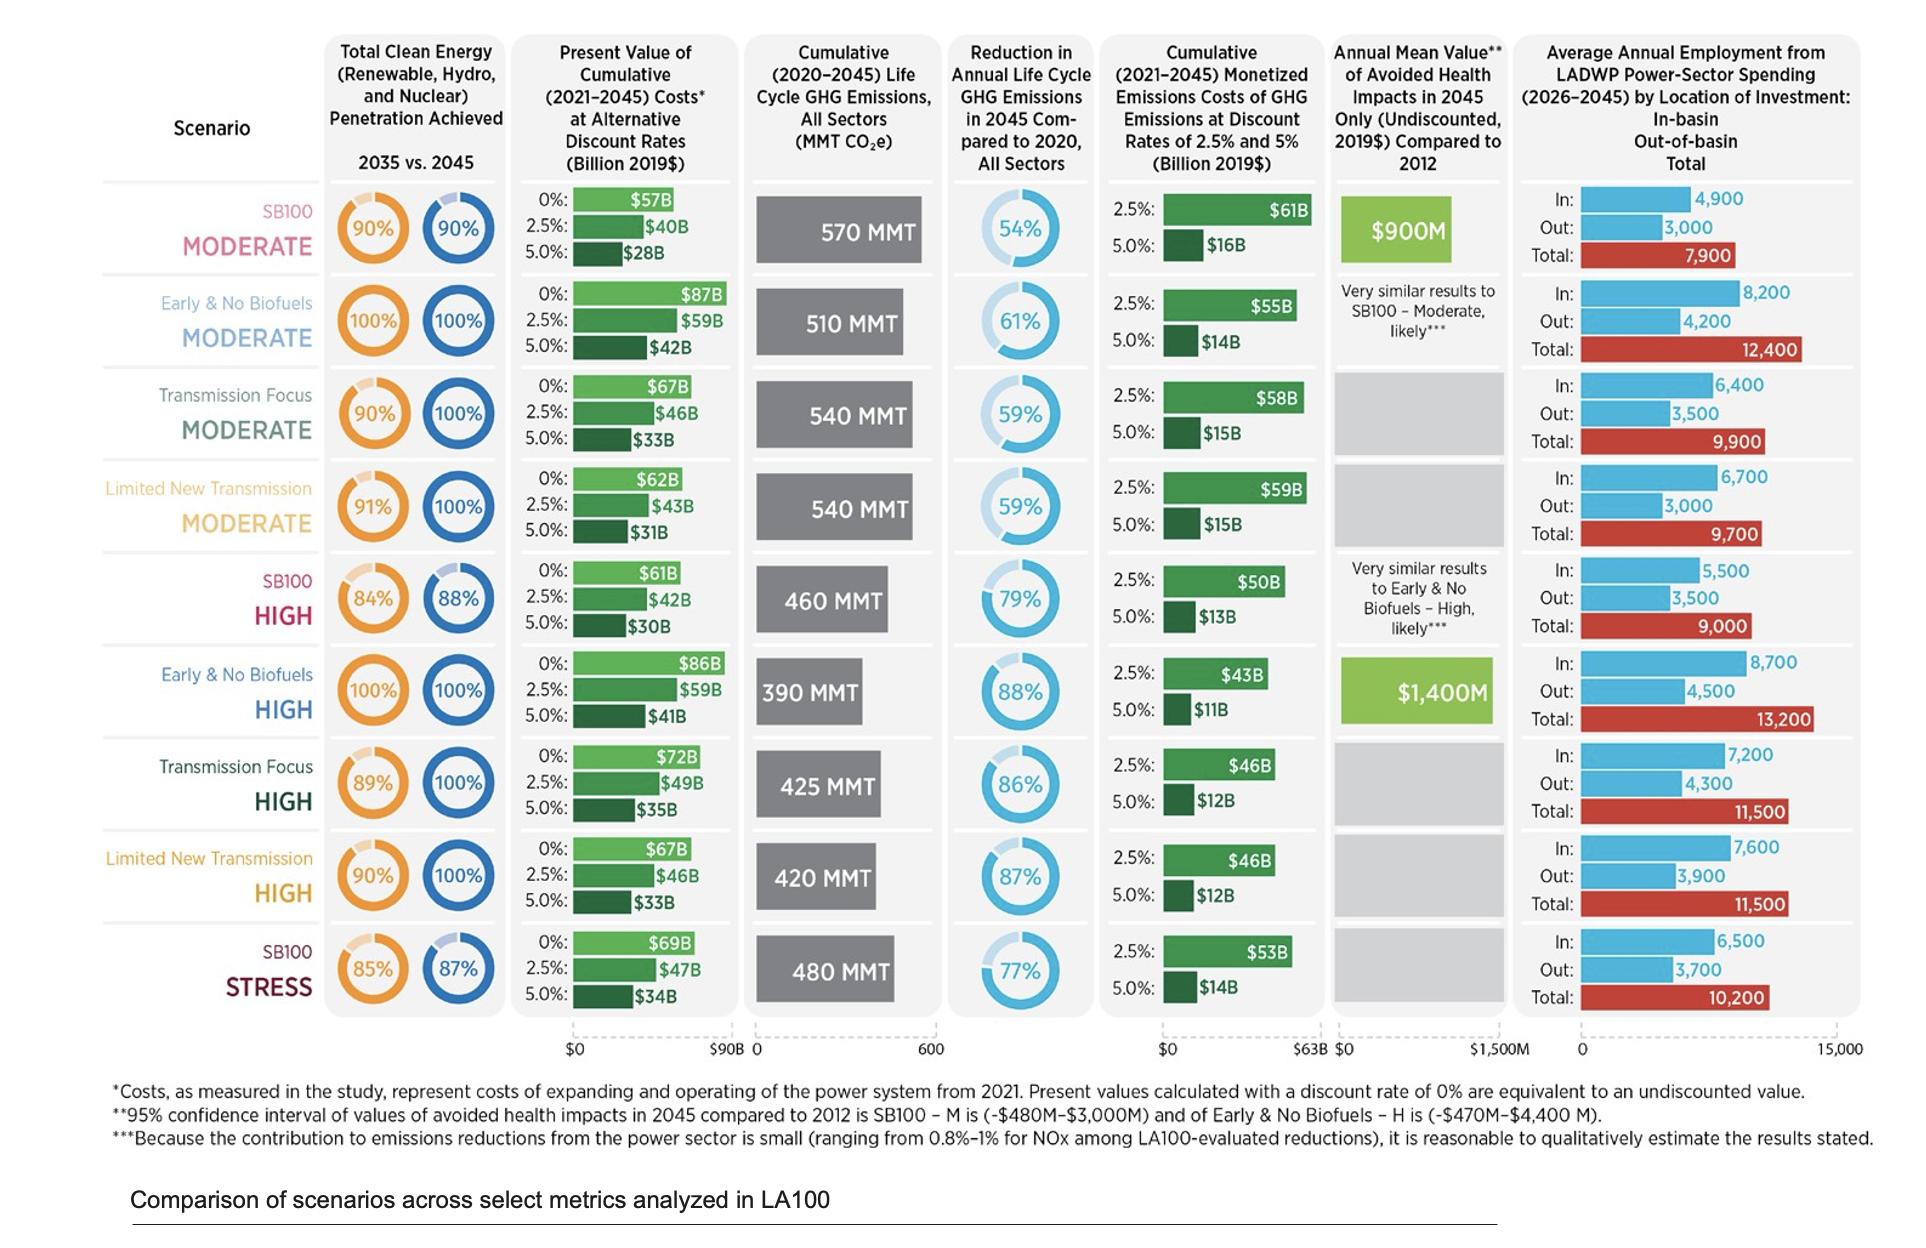 Comparison of scenarios across select metrics analyzed in LA100